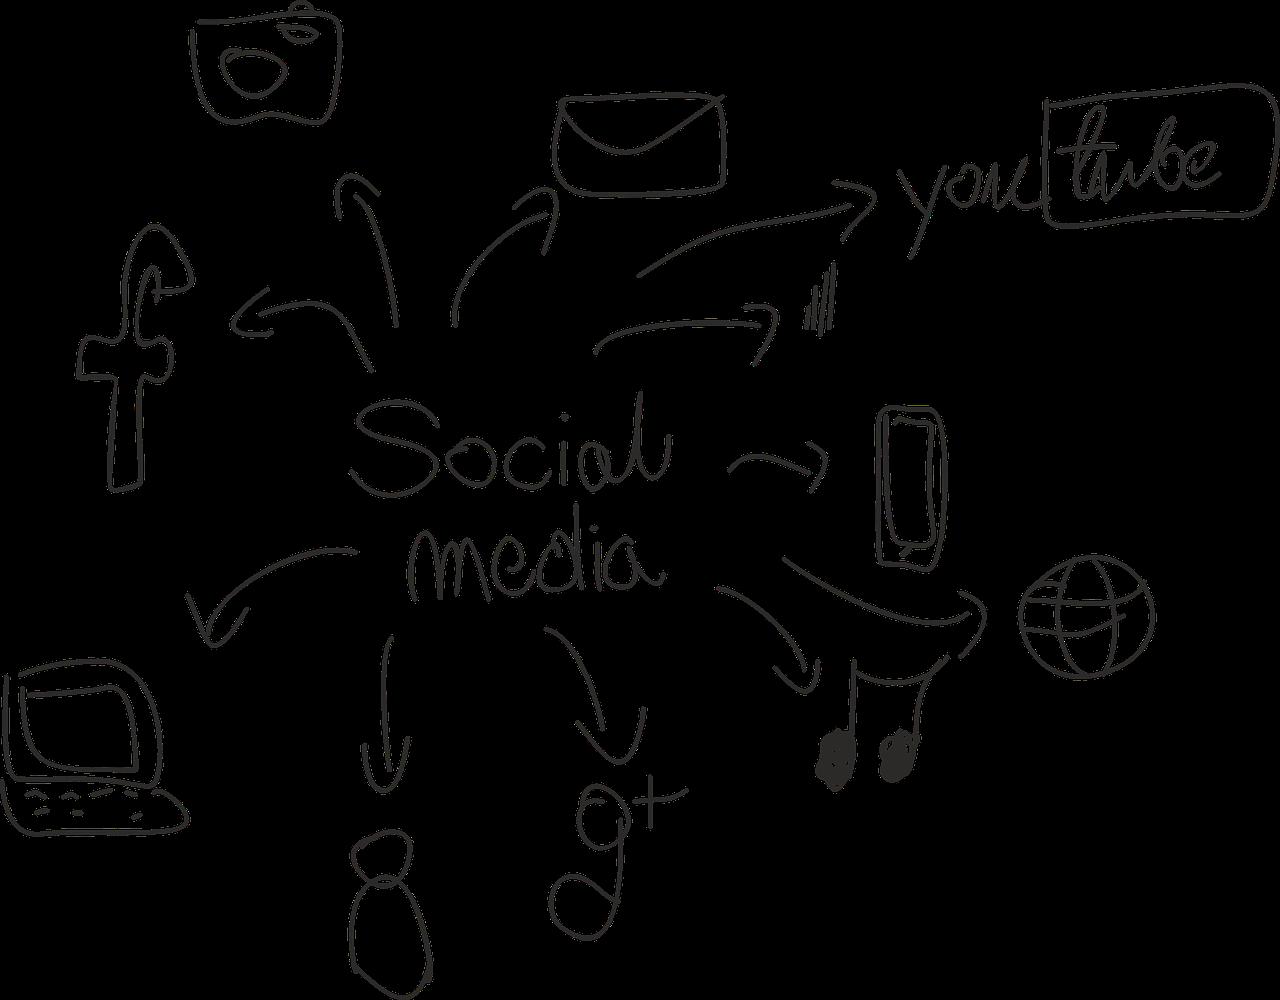 drzewo social mediów